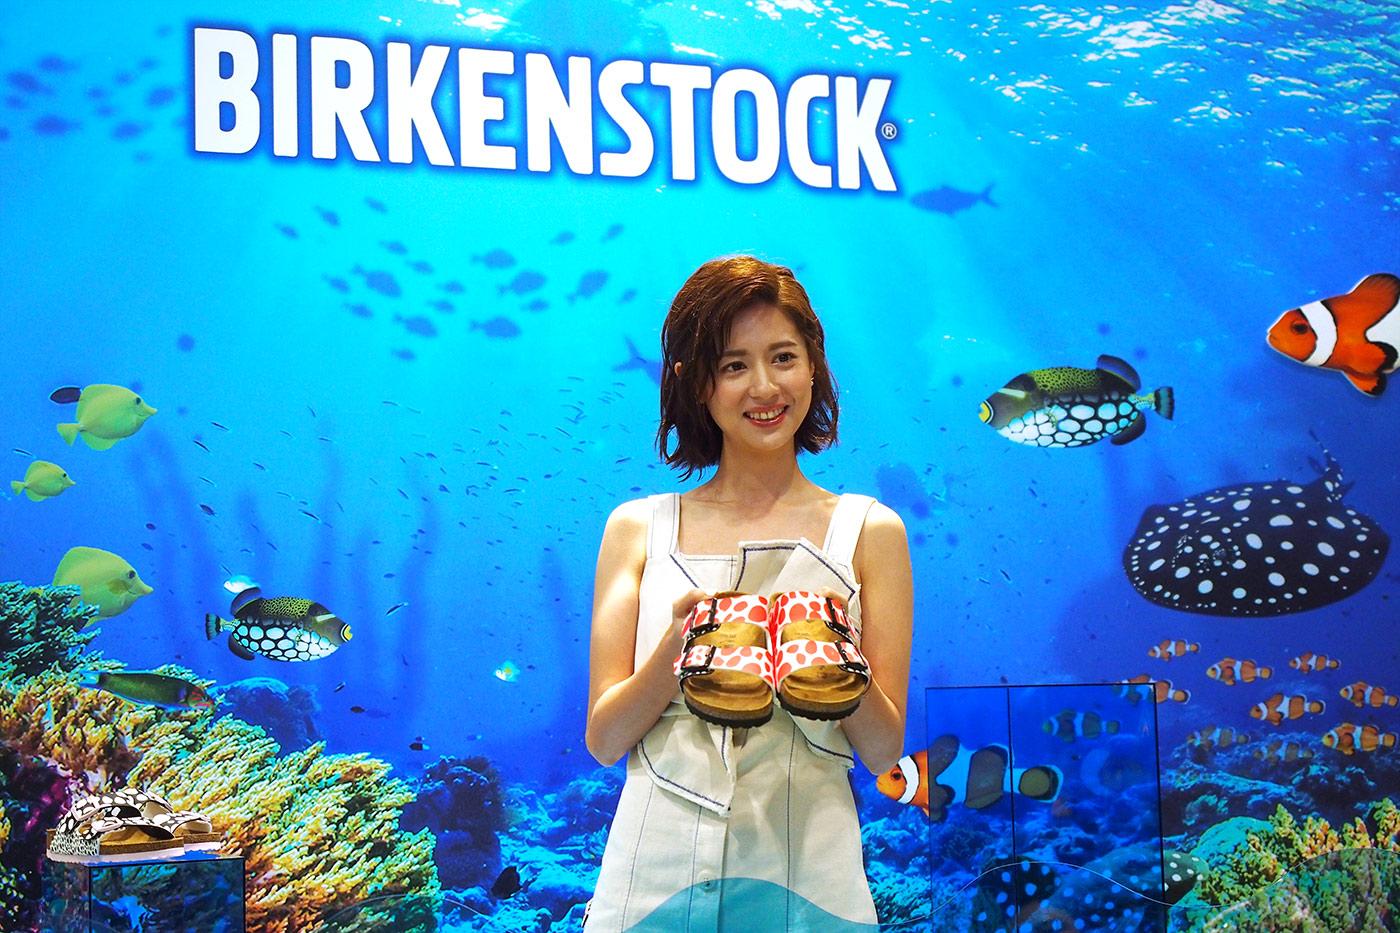 birkesnstock-2019-sandals-09